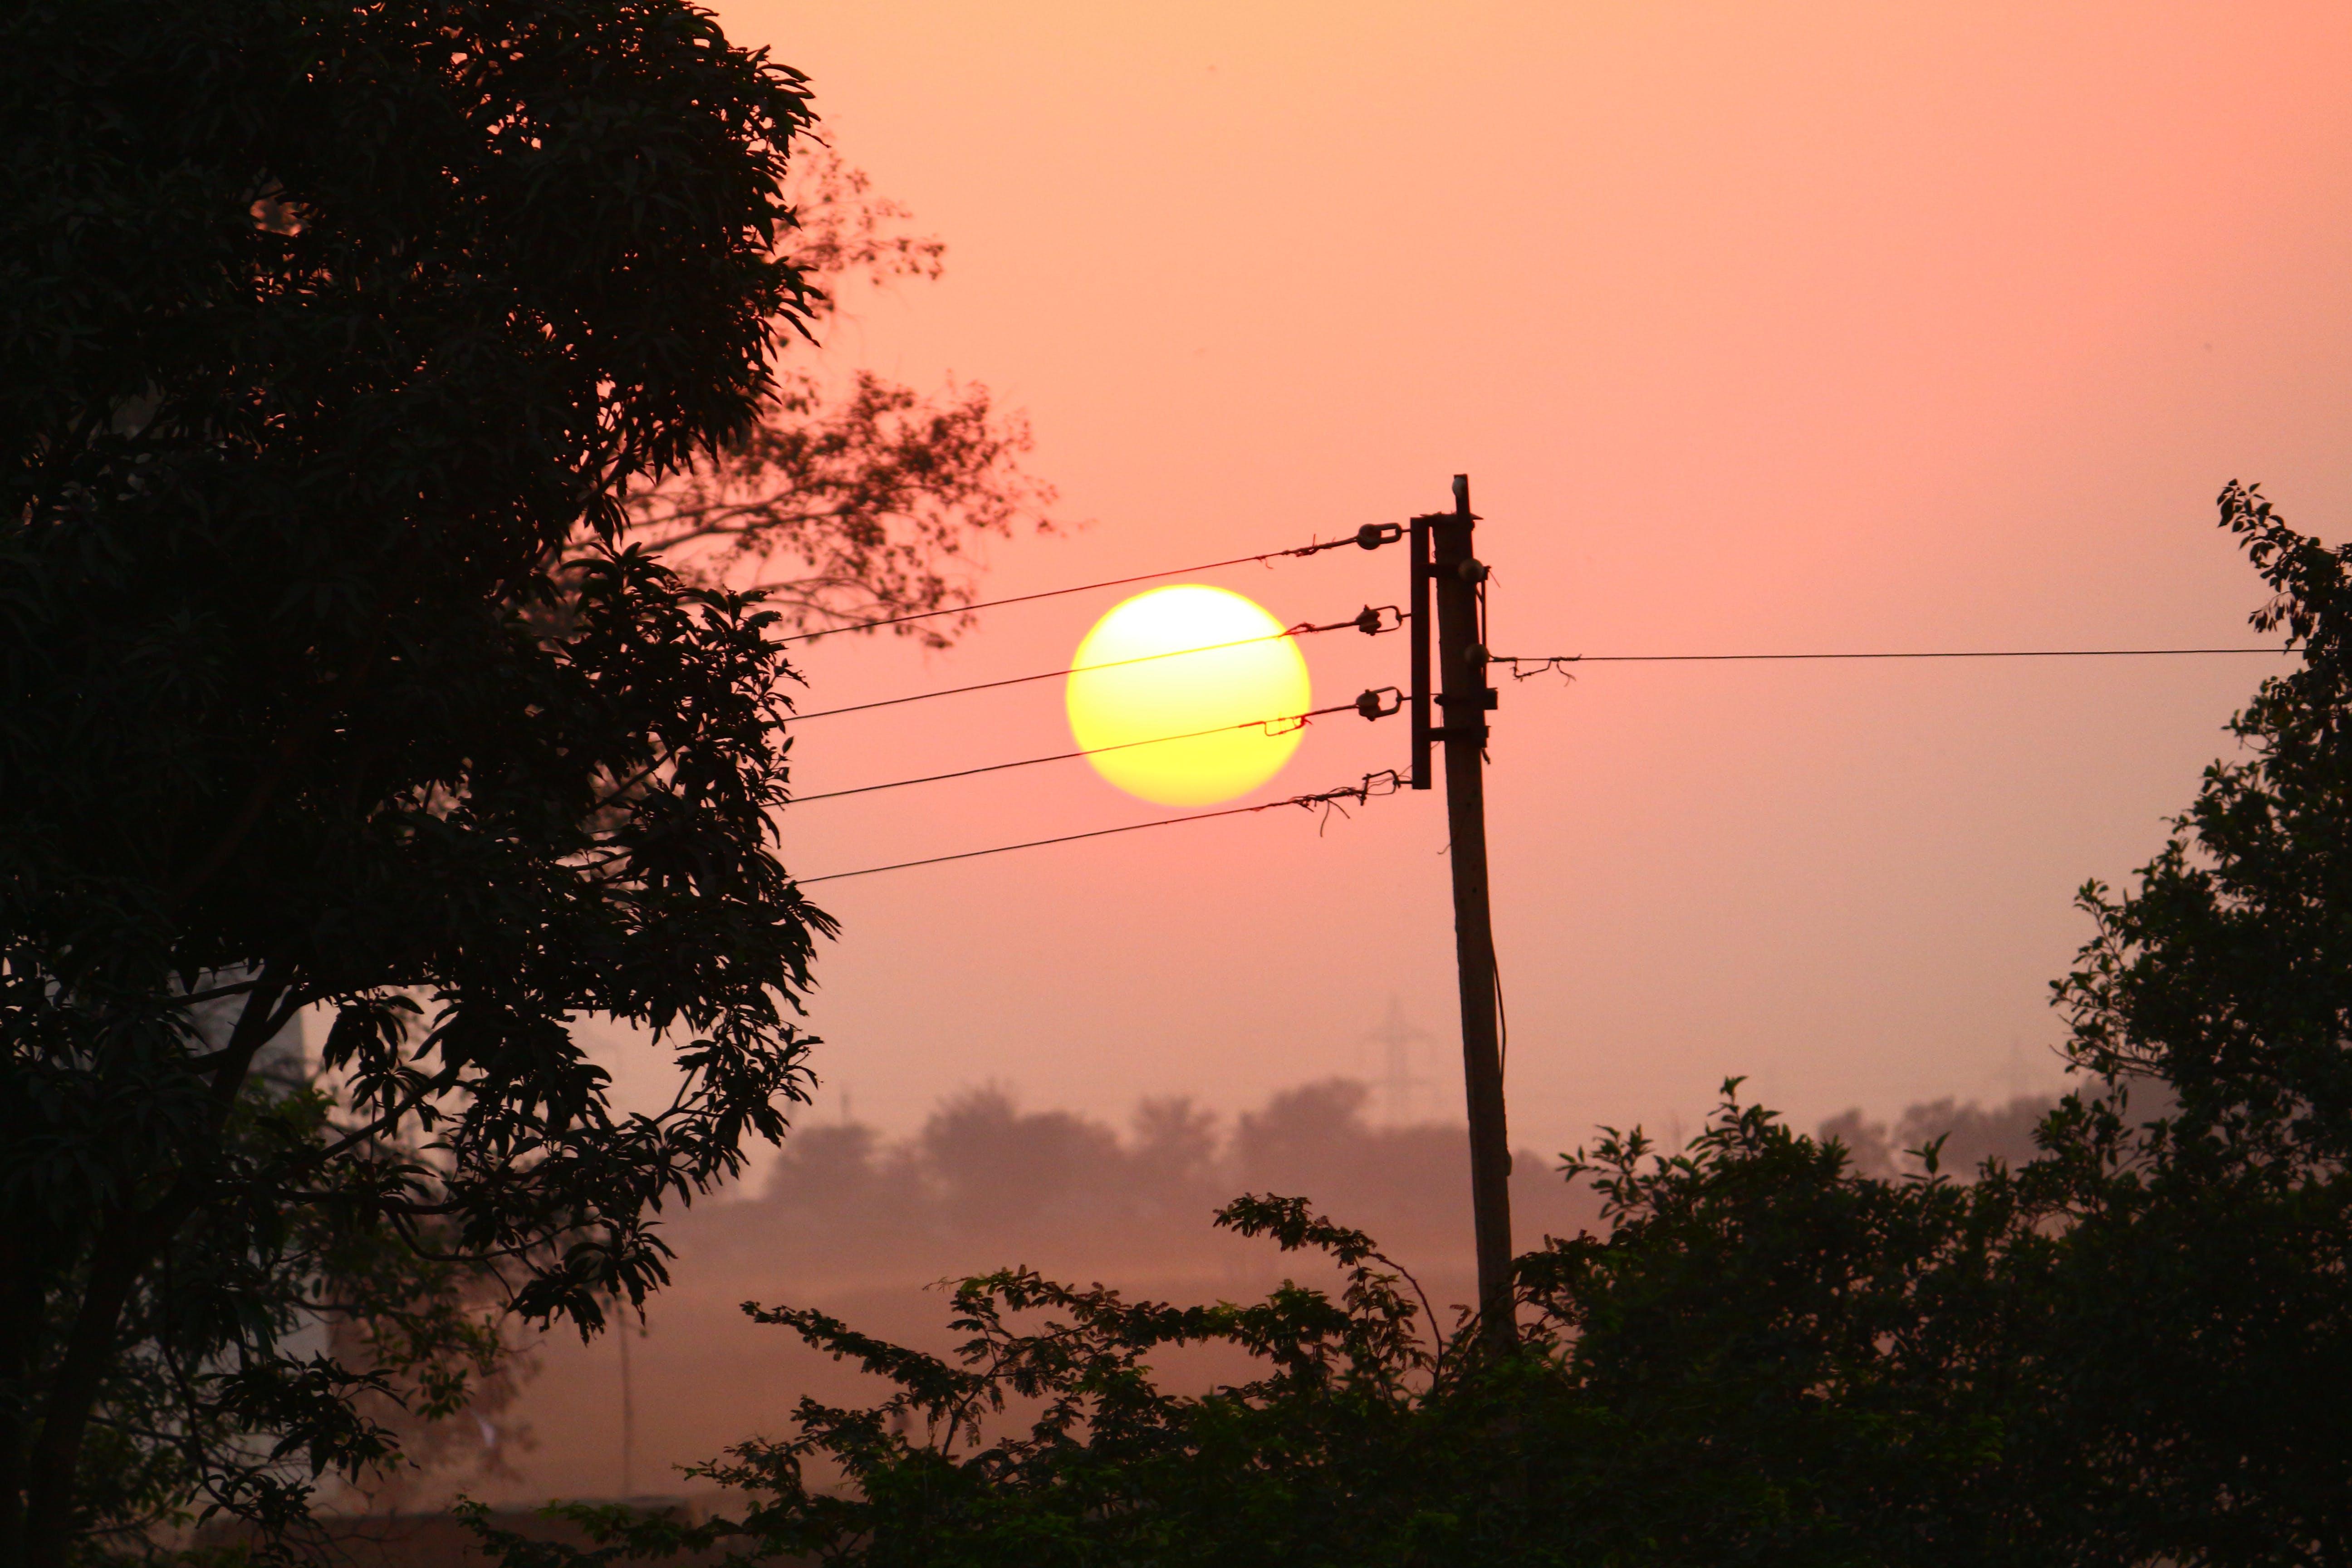 Free stock photo of #sunset #dslr #photographers #nature #canon #life